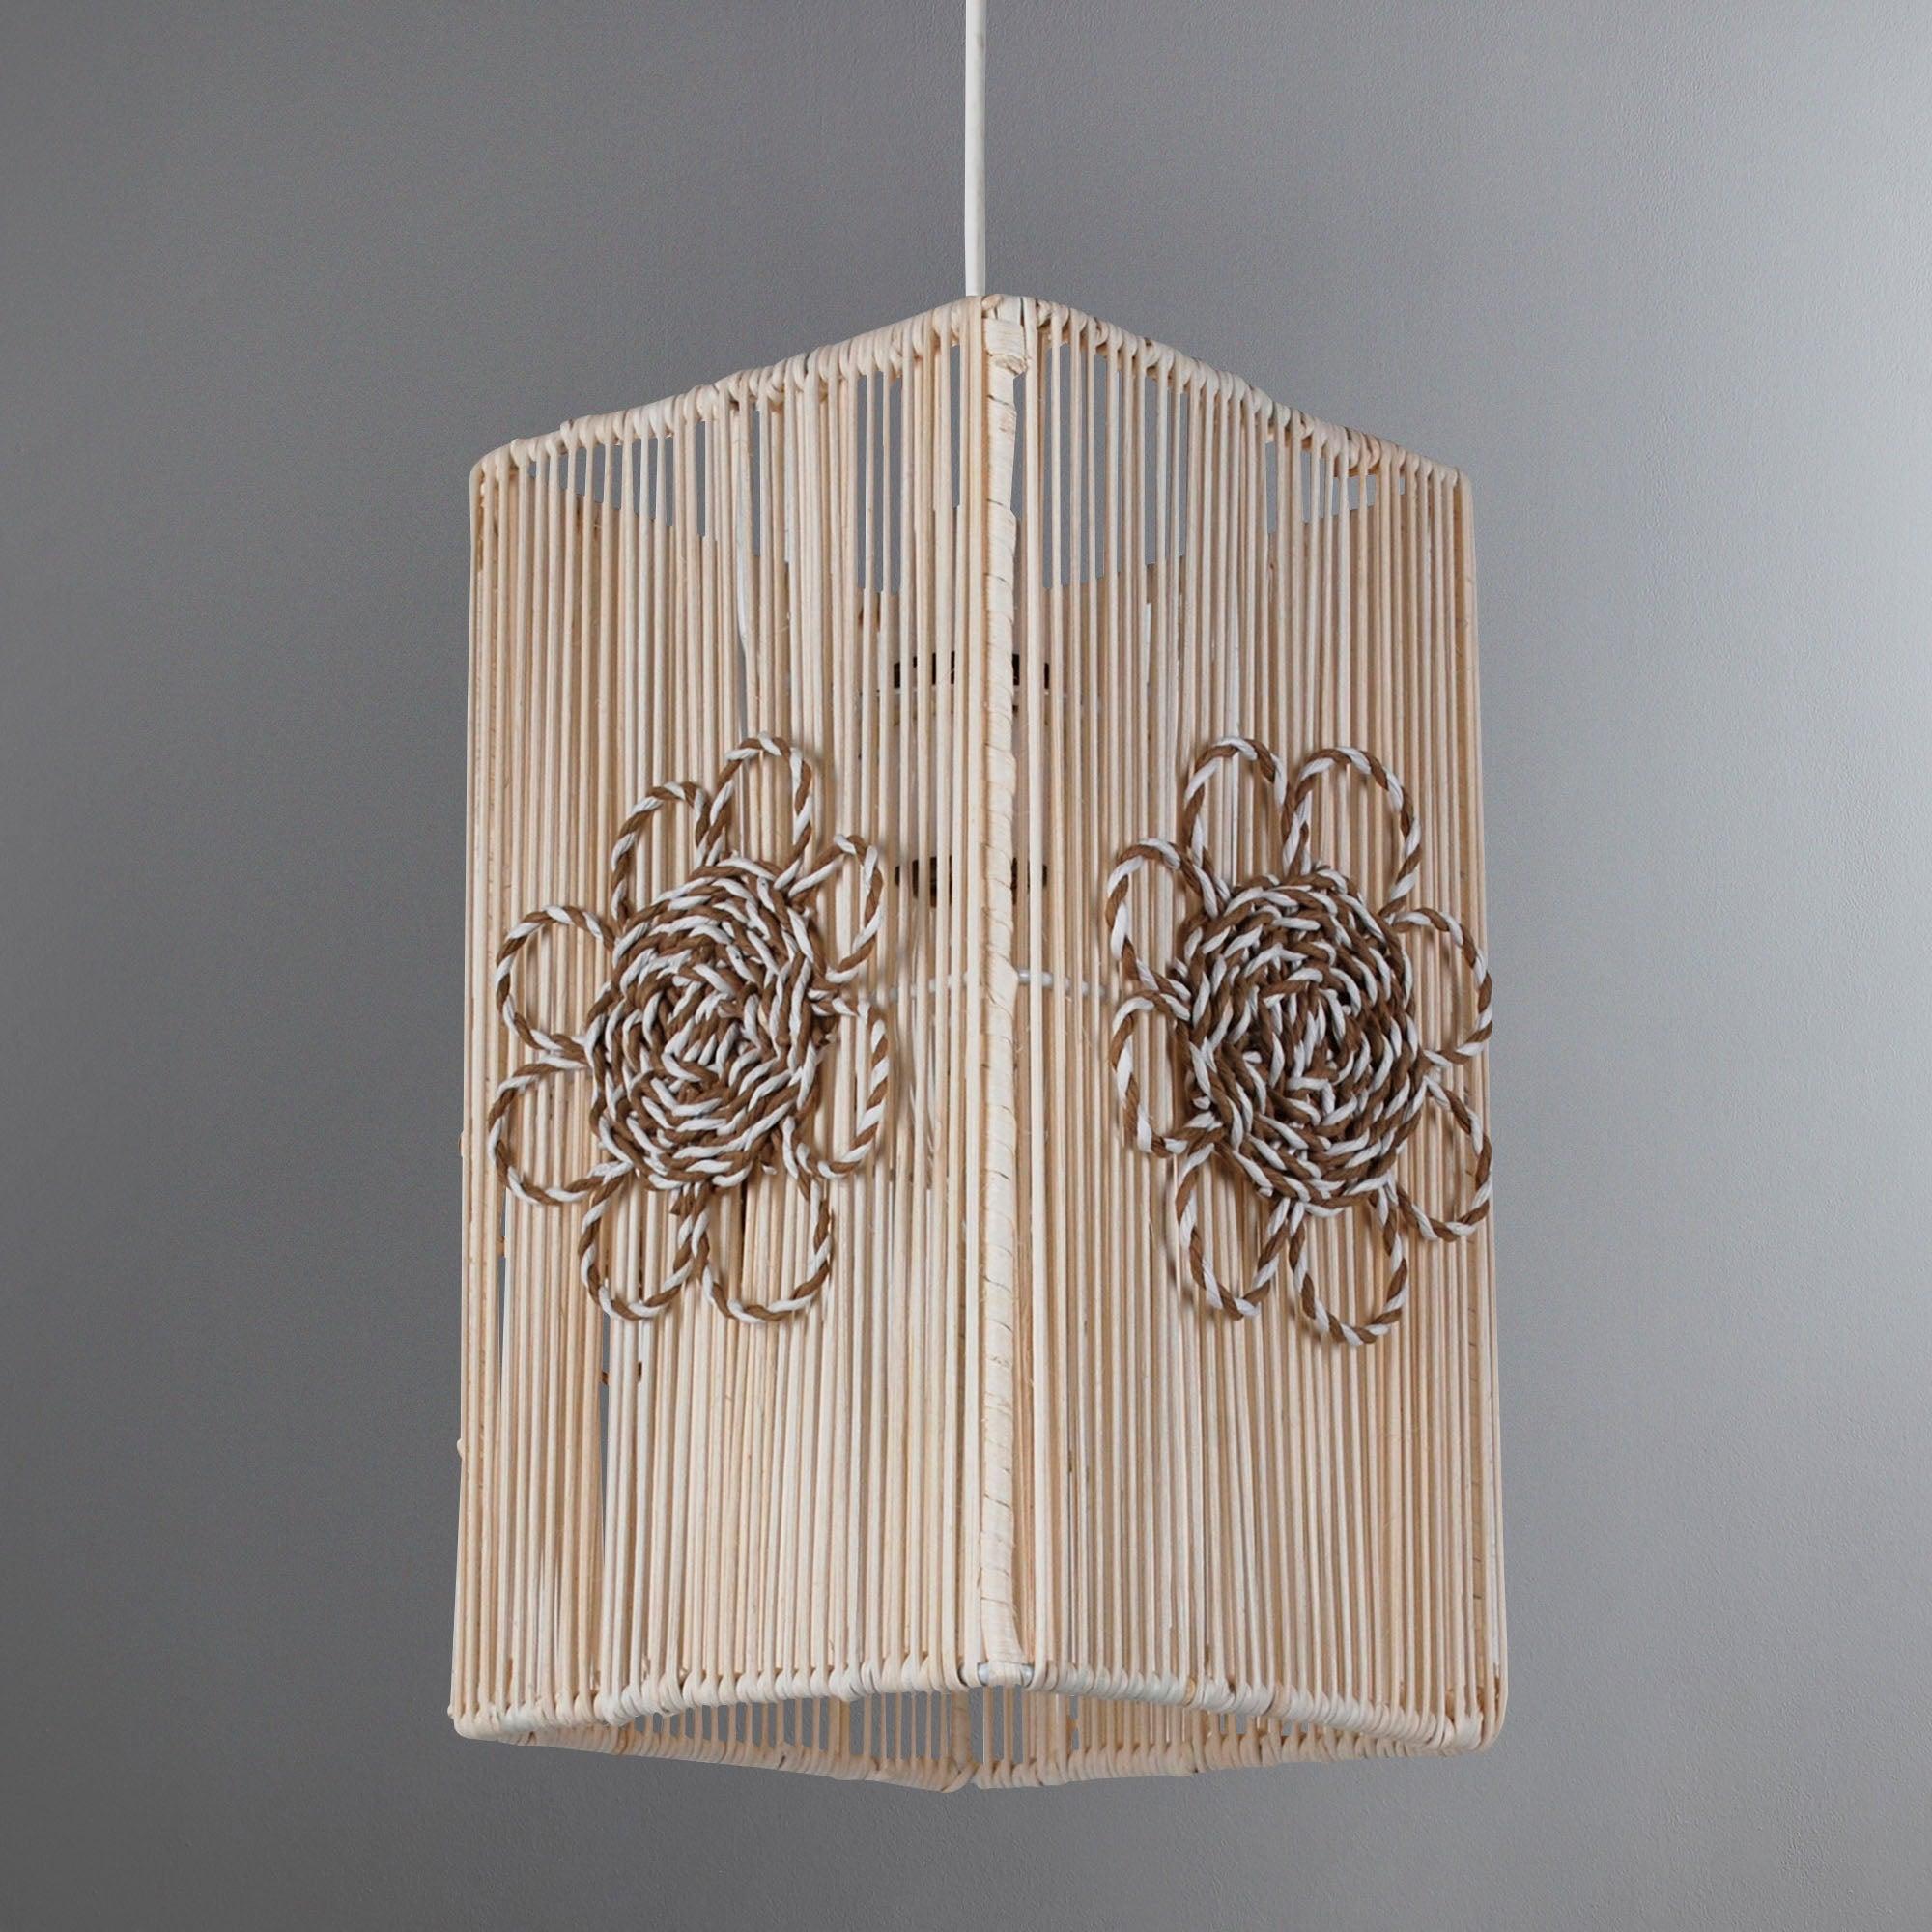 Square Rattan Flower Ceiling Pendant